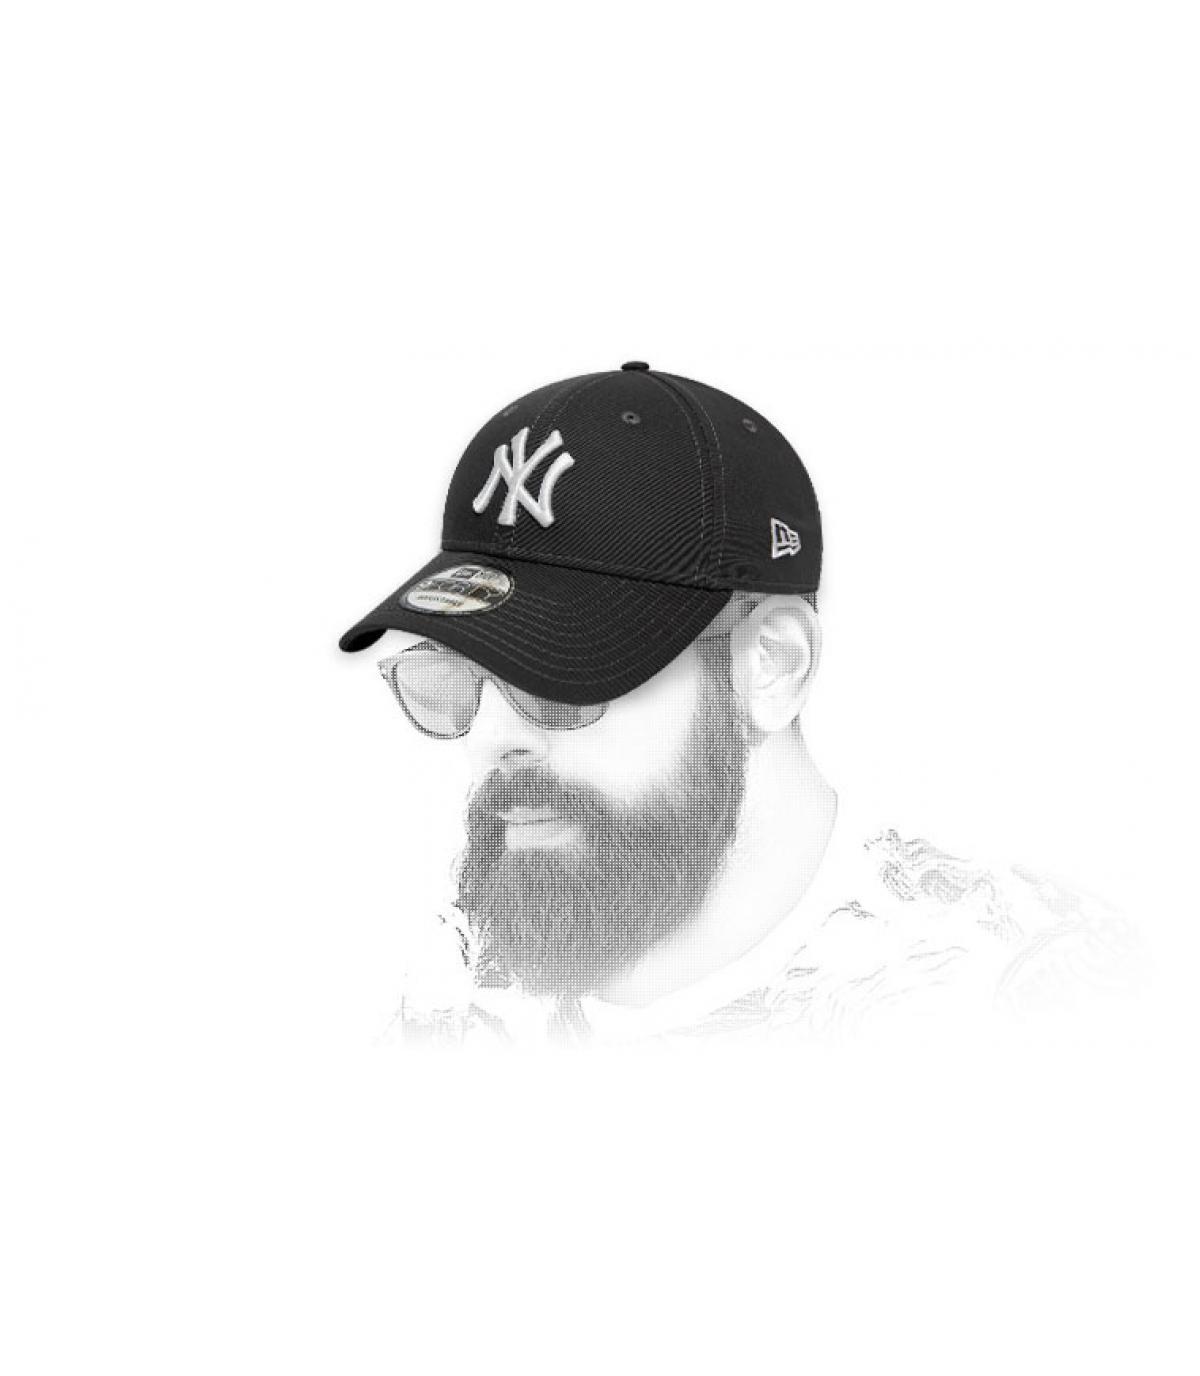 gorra NY gris blanco